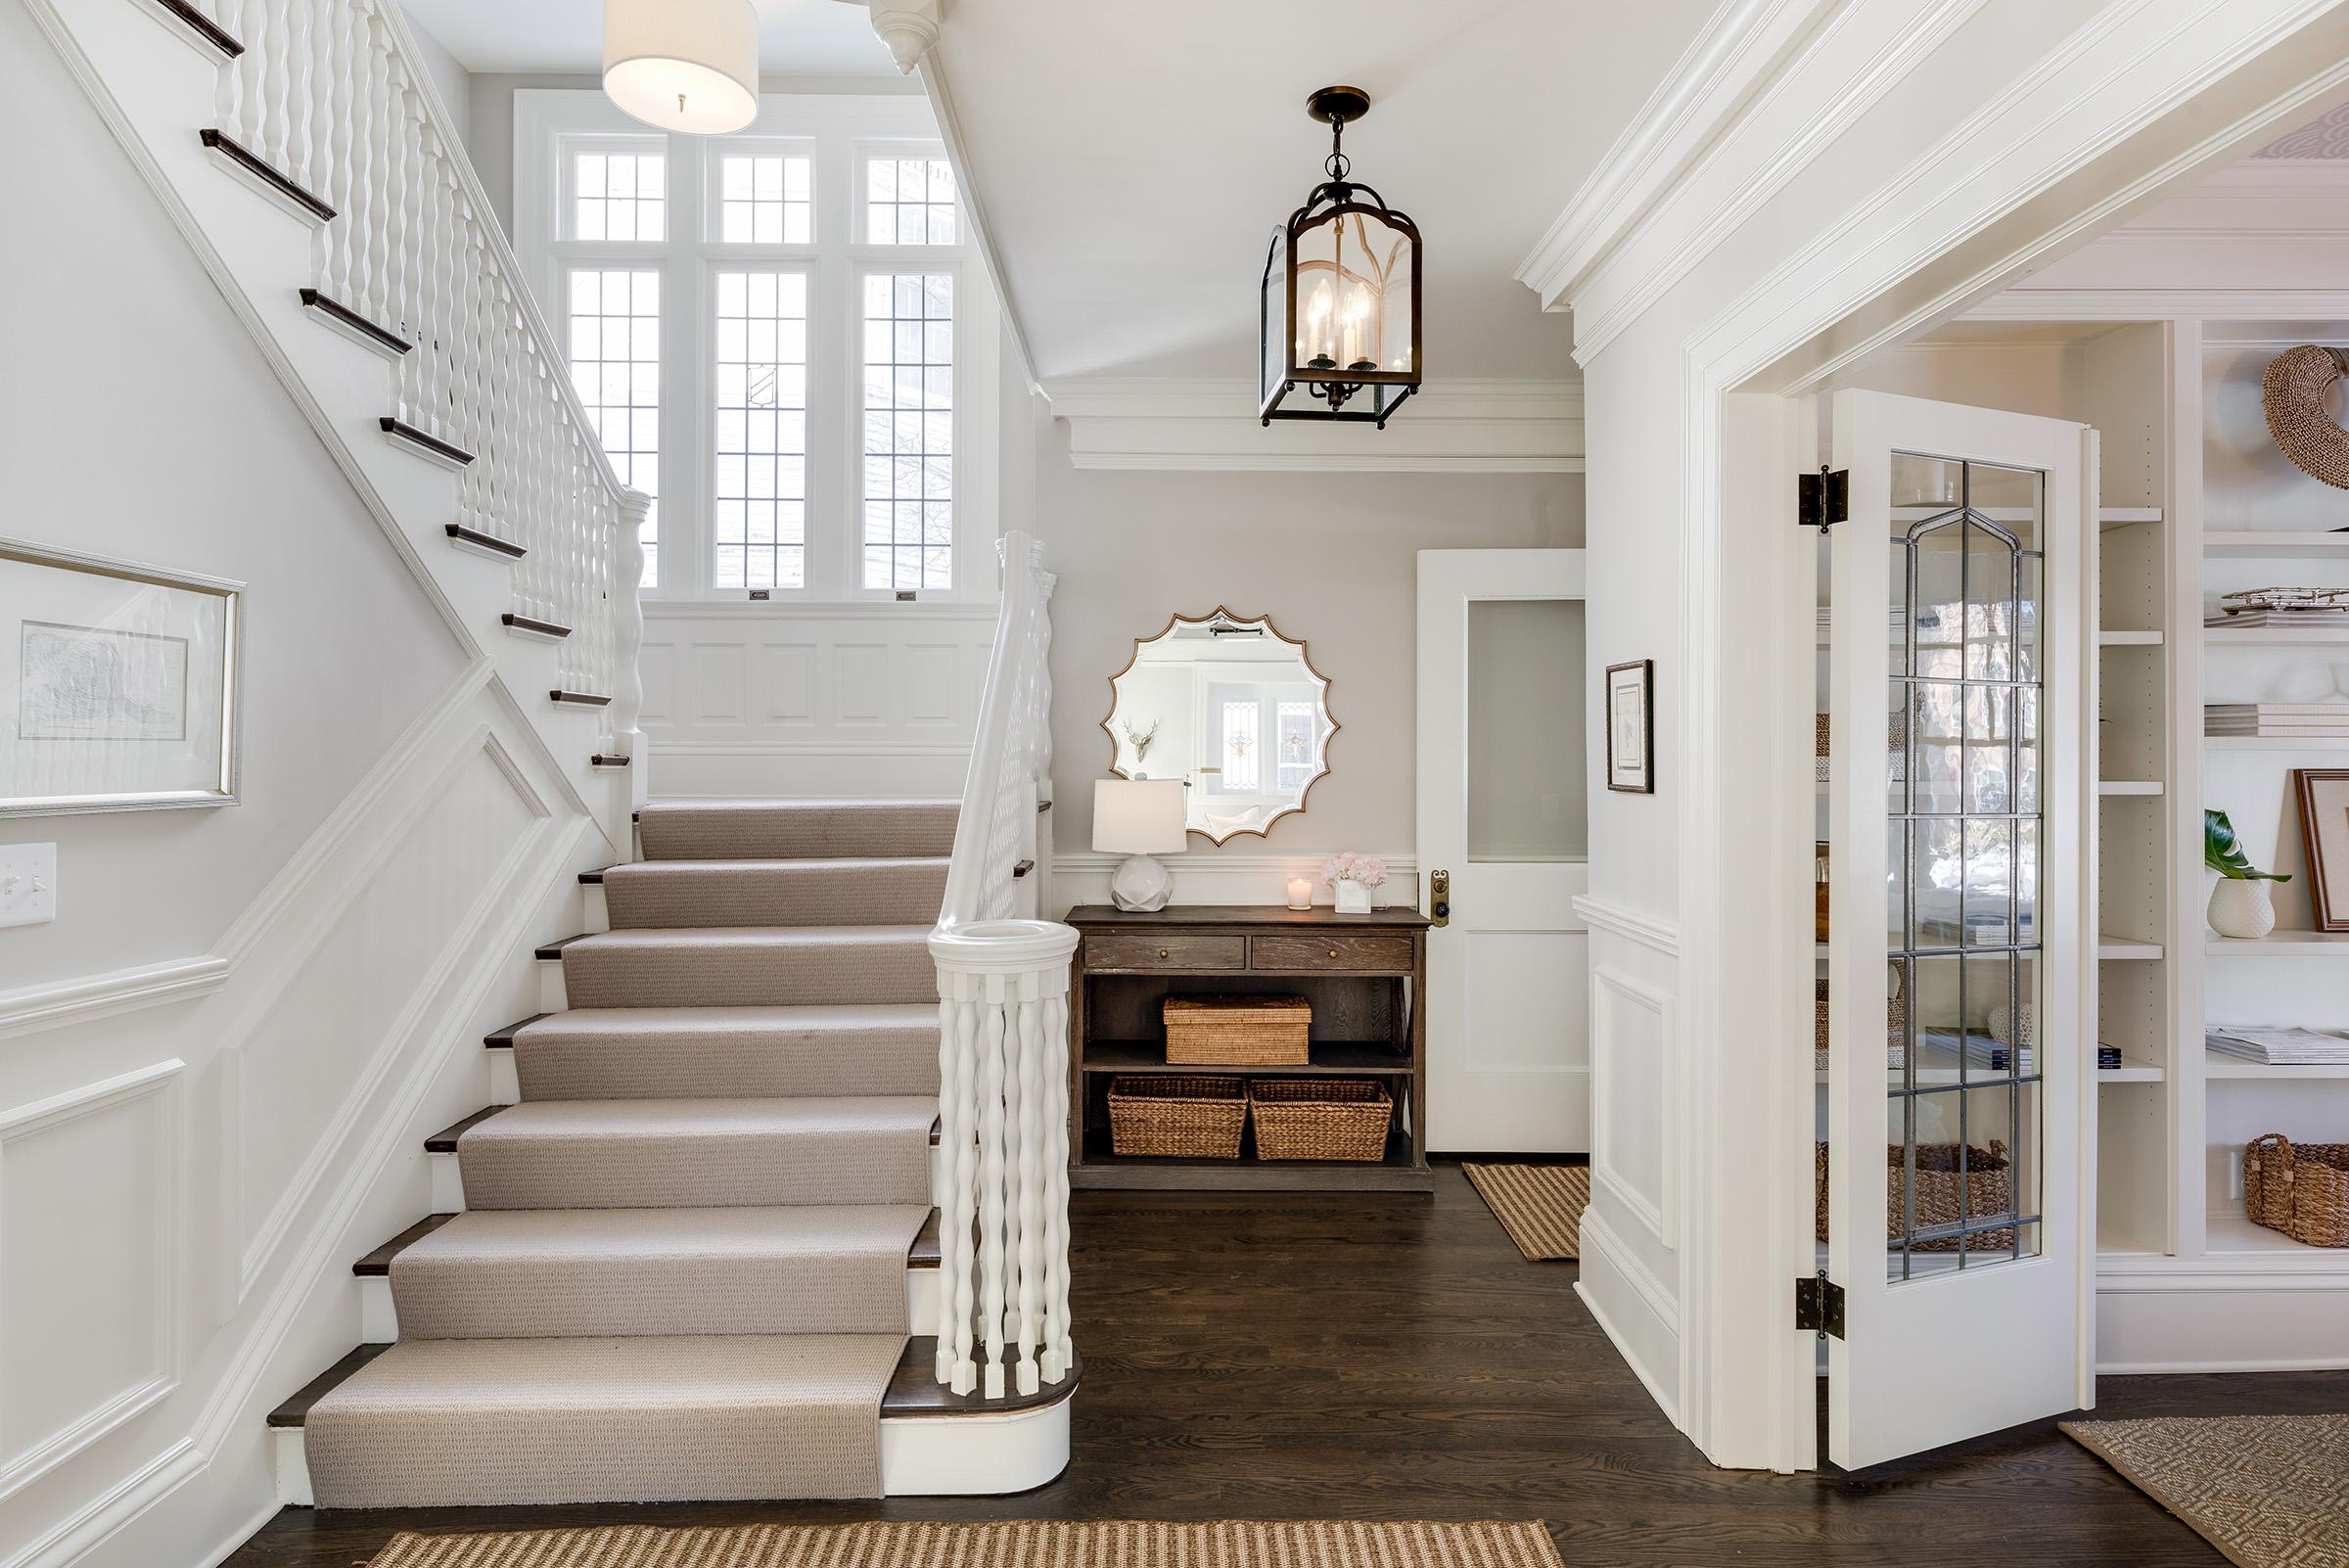 5humbolt- stairscase1.jpg